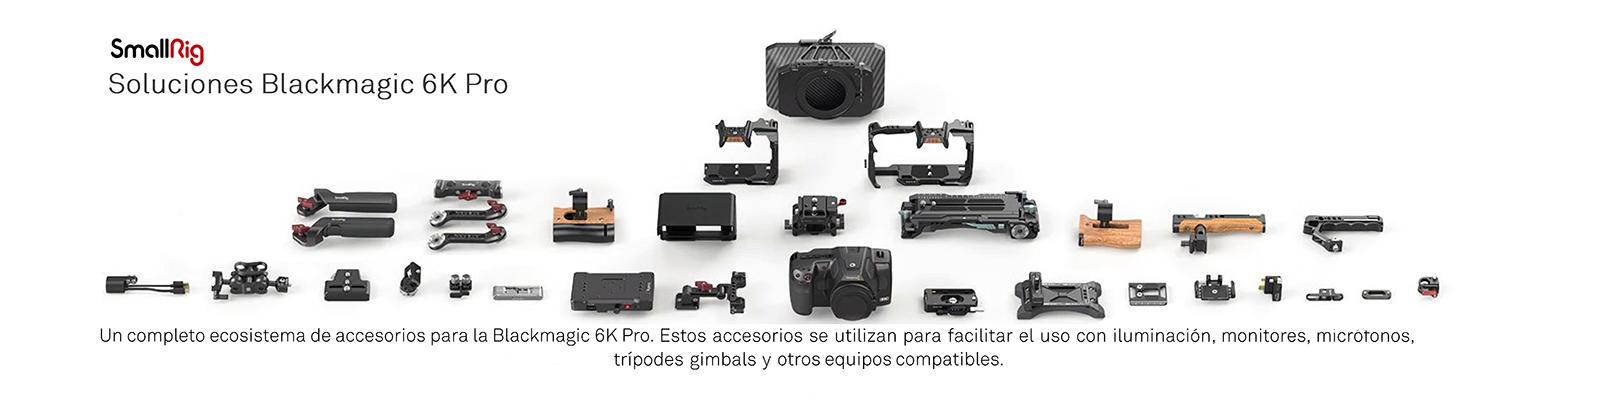 Accesorios BlackMagic 6K Pro